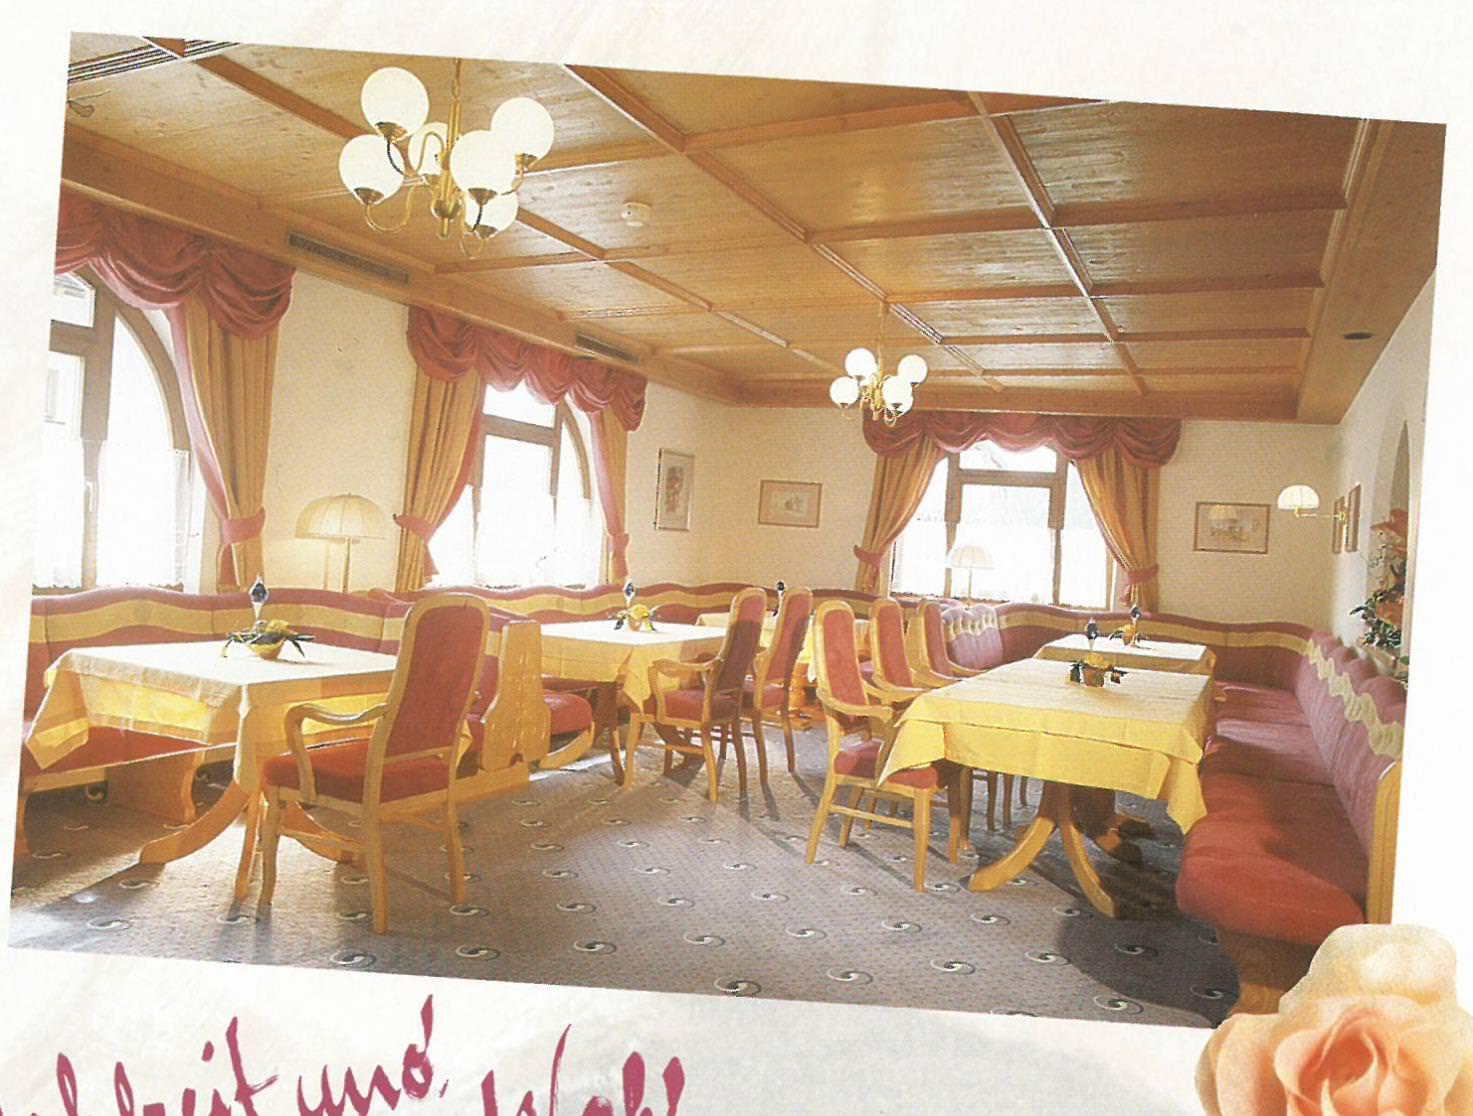 Halle-1995.jpg